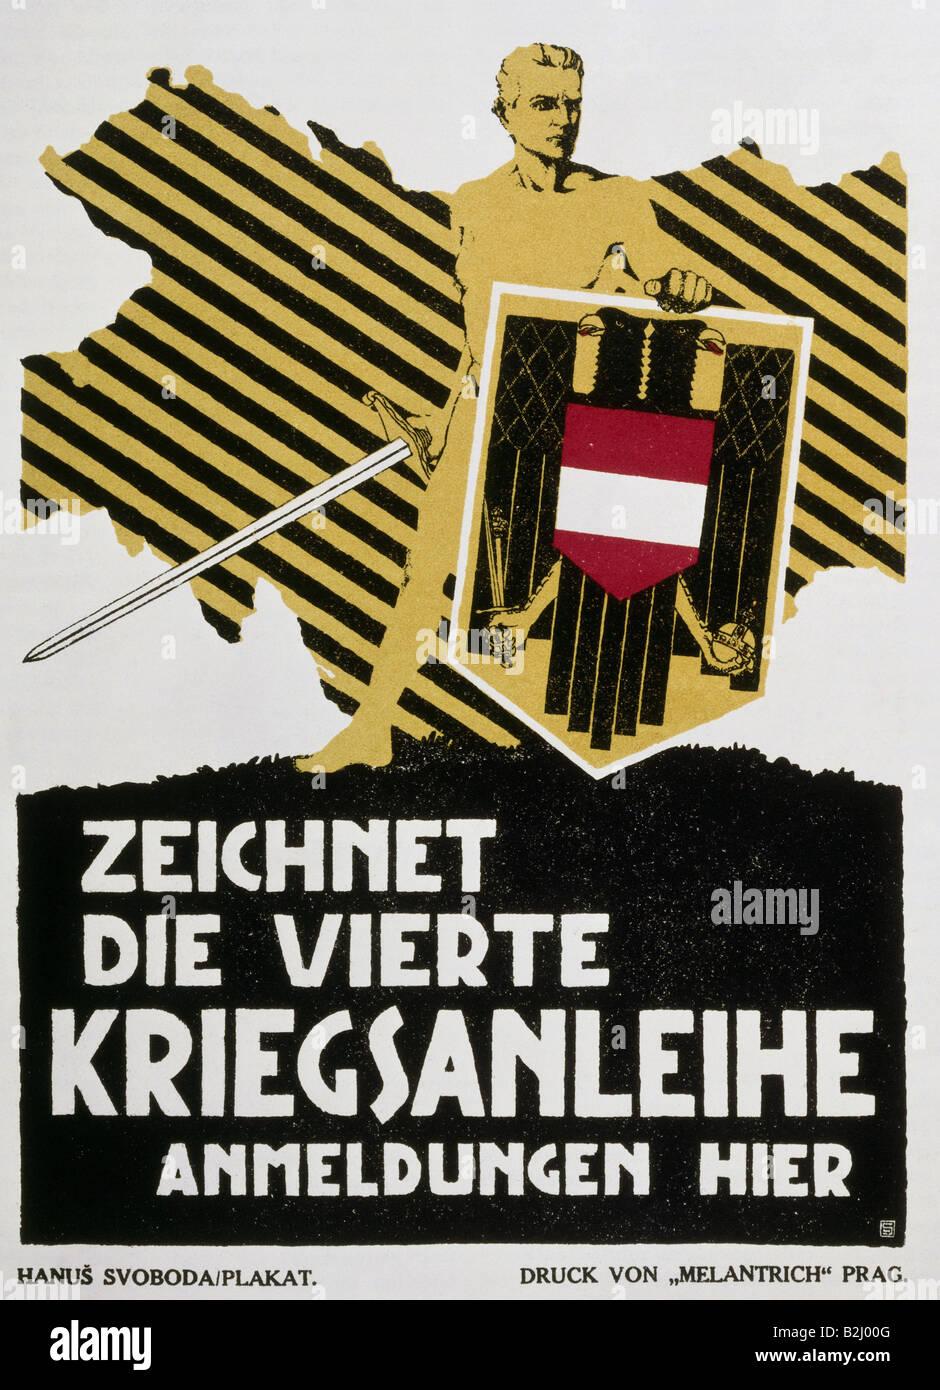 Eventos, Primera Guerra Mundial / WWI, propaganda, póster \